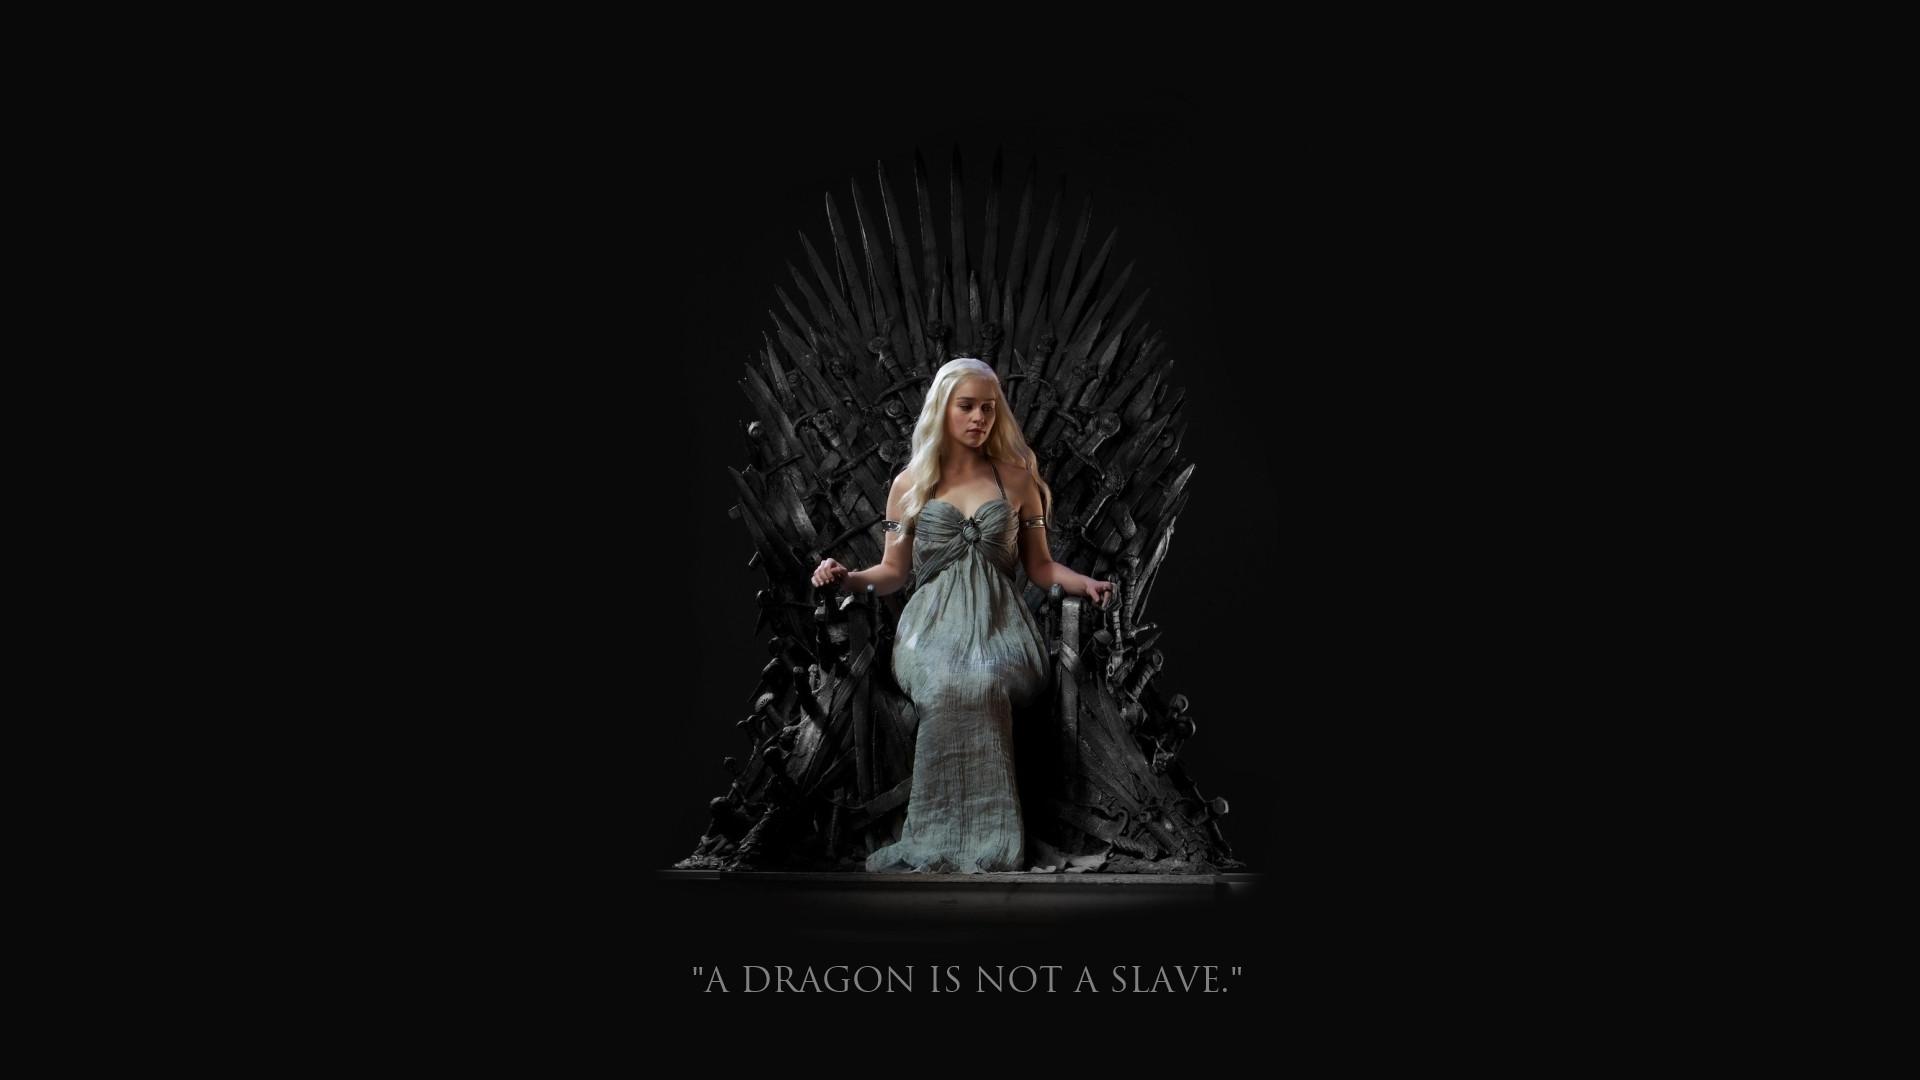 Game Of Thrones Fantasy Dragon Wallpaper  1920x1080 218932 WallpaperUP